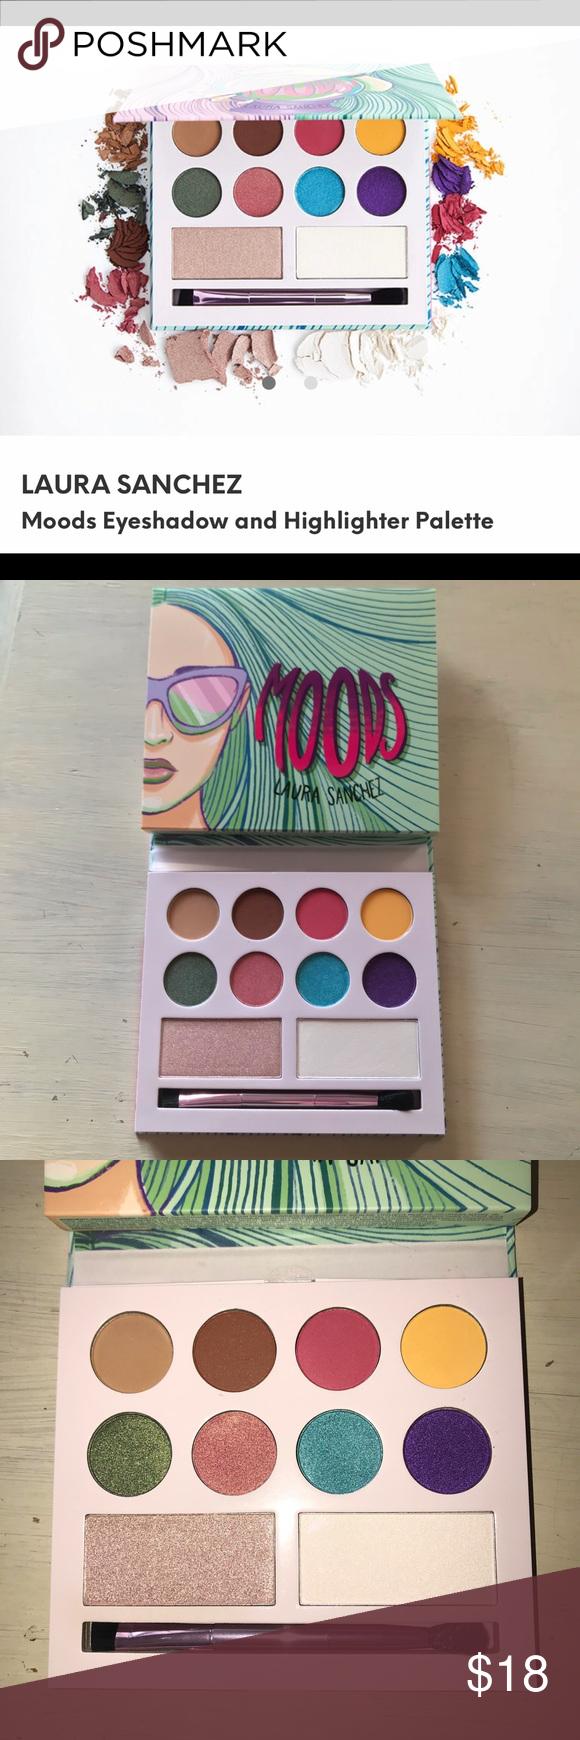 Eyeshadow palette Laura Sanchez Moods New in box. Laura